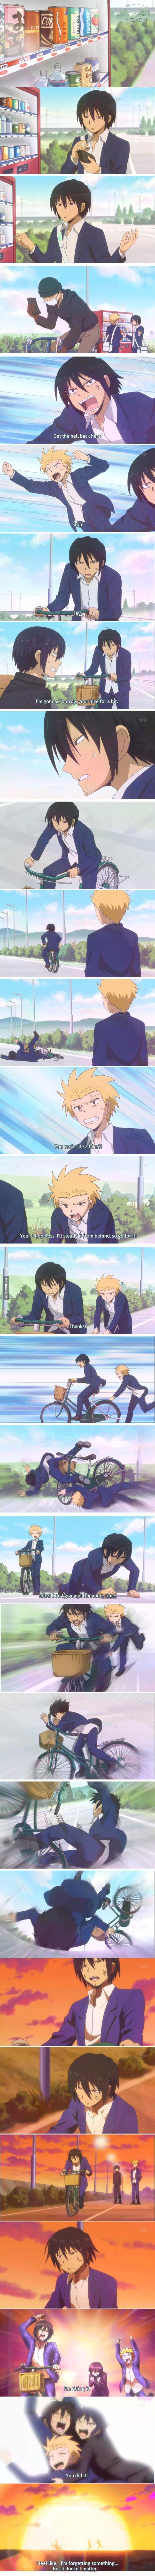 Just an Asian anime